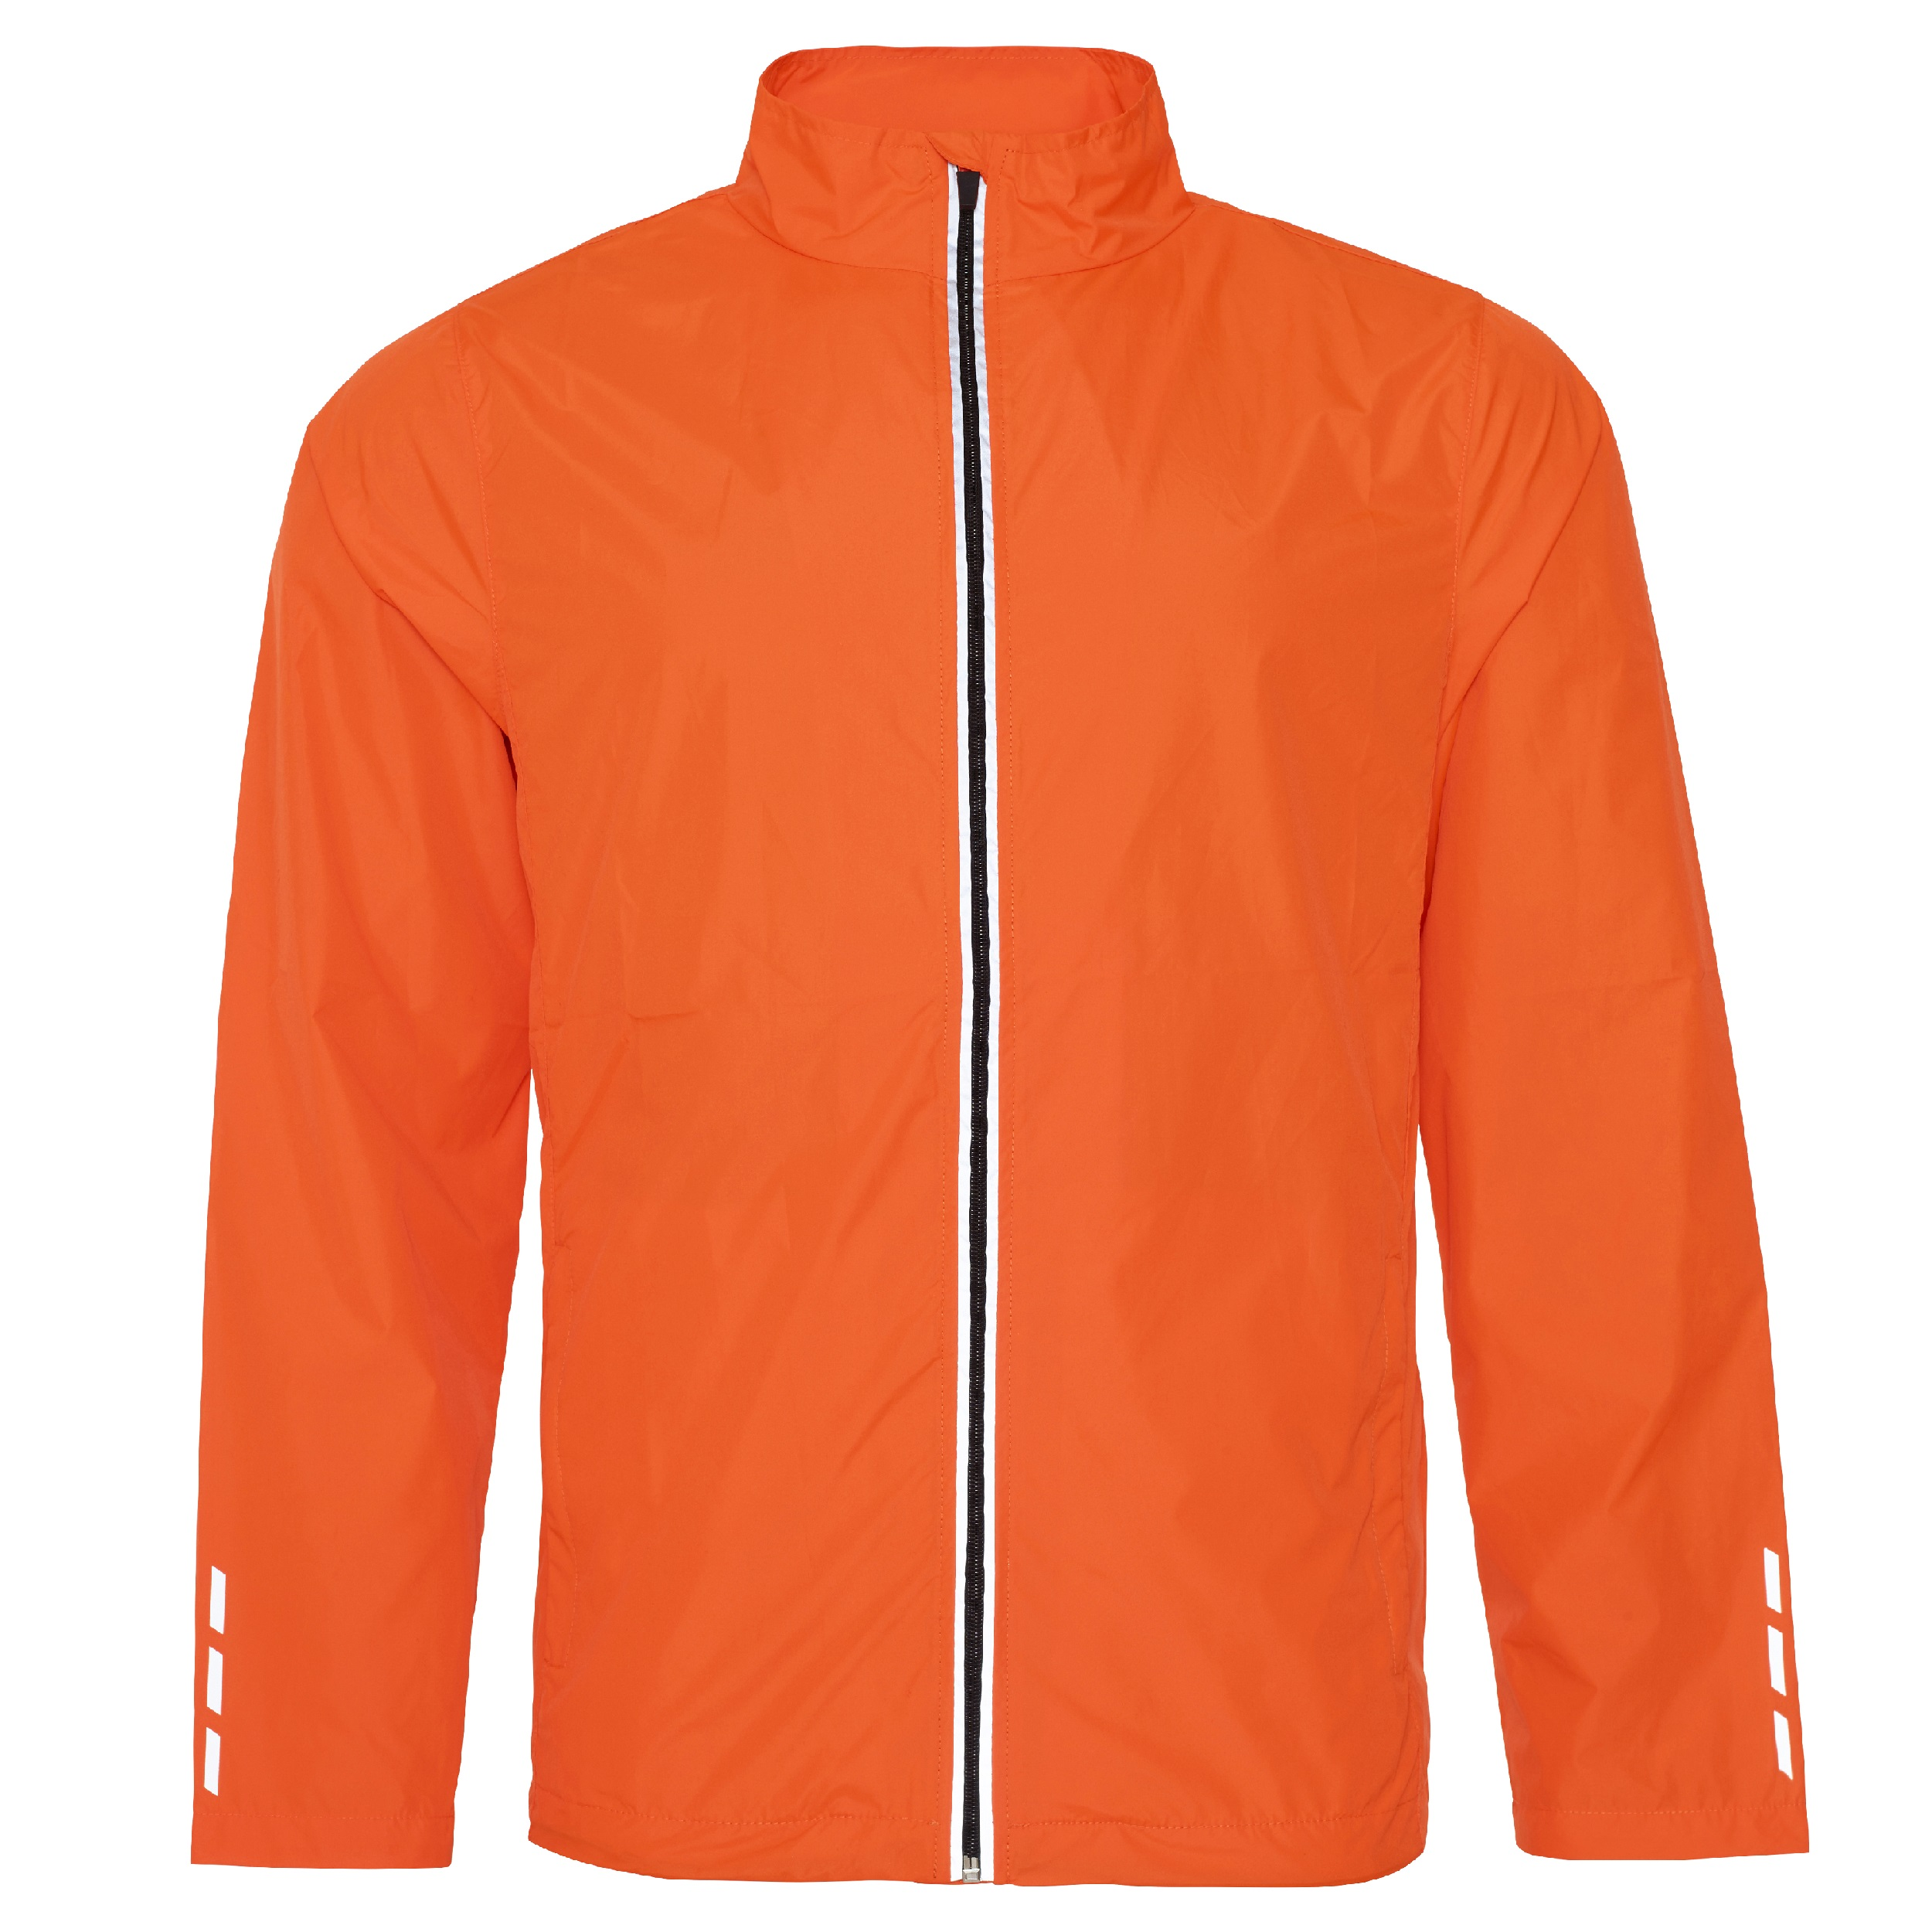 Juoksijan takki Cool, Electric Orange